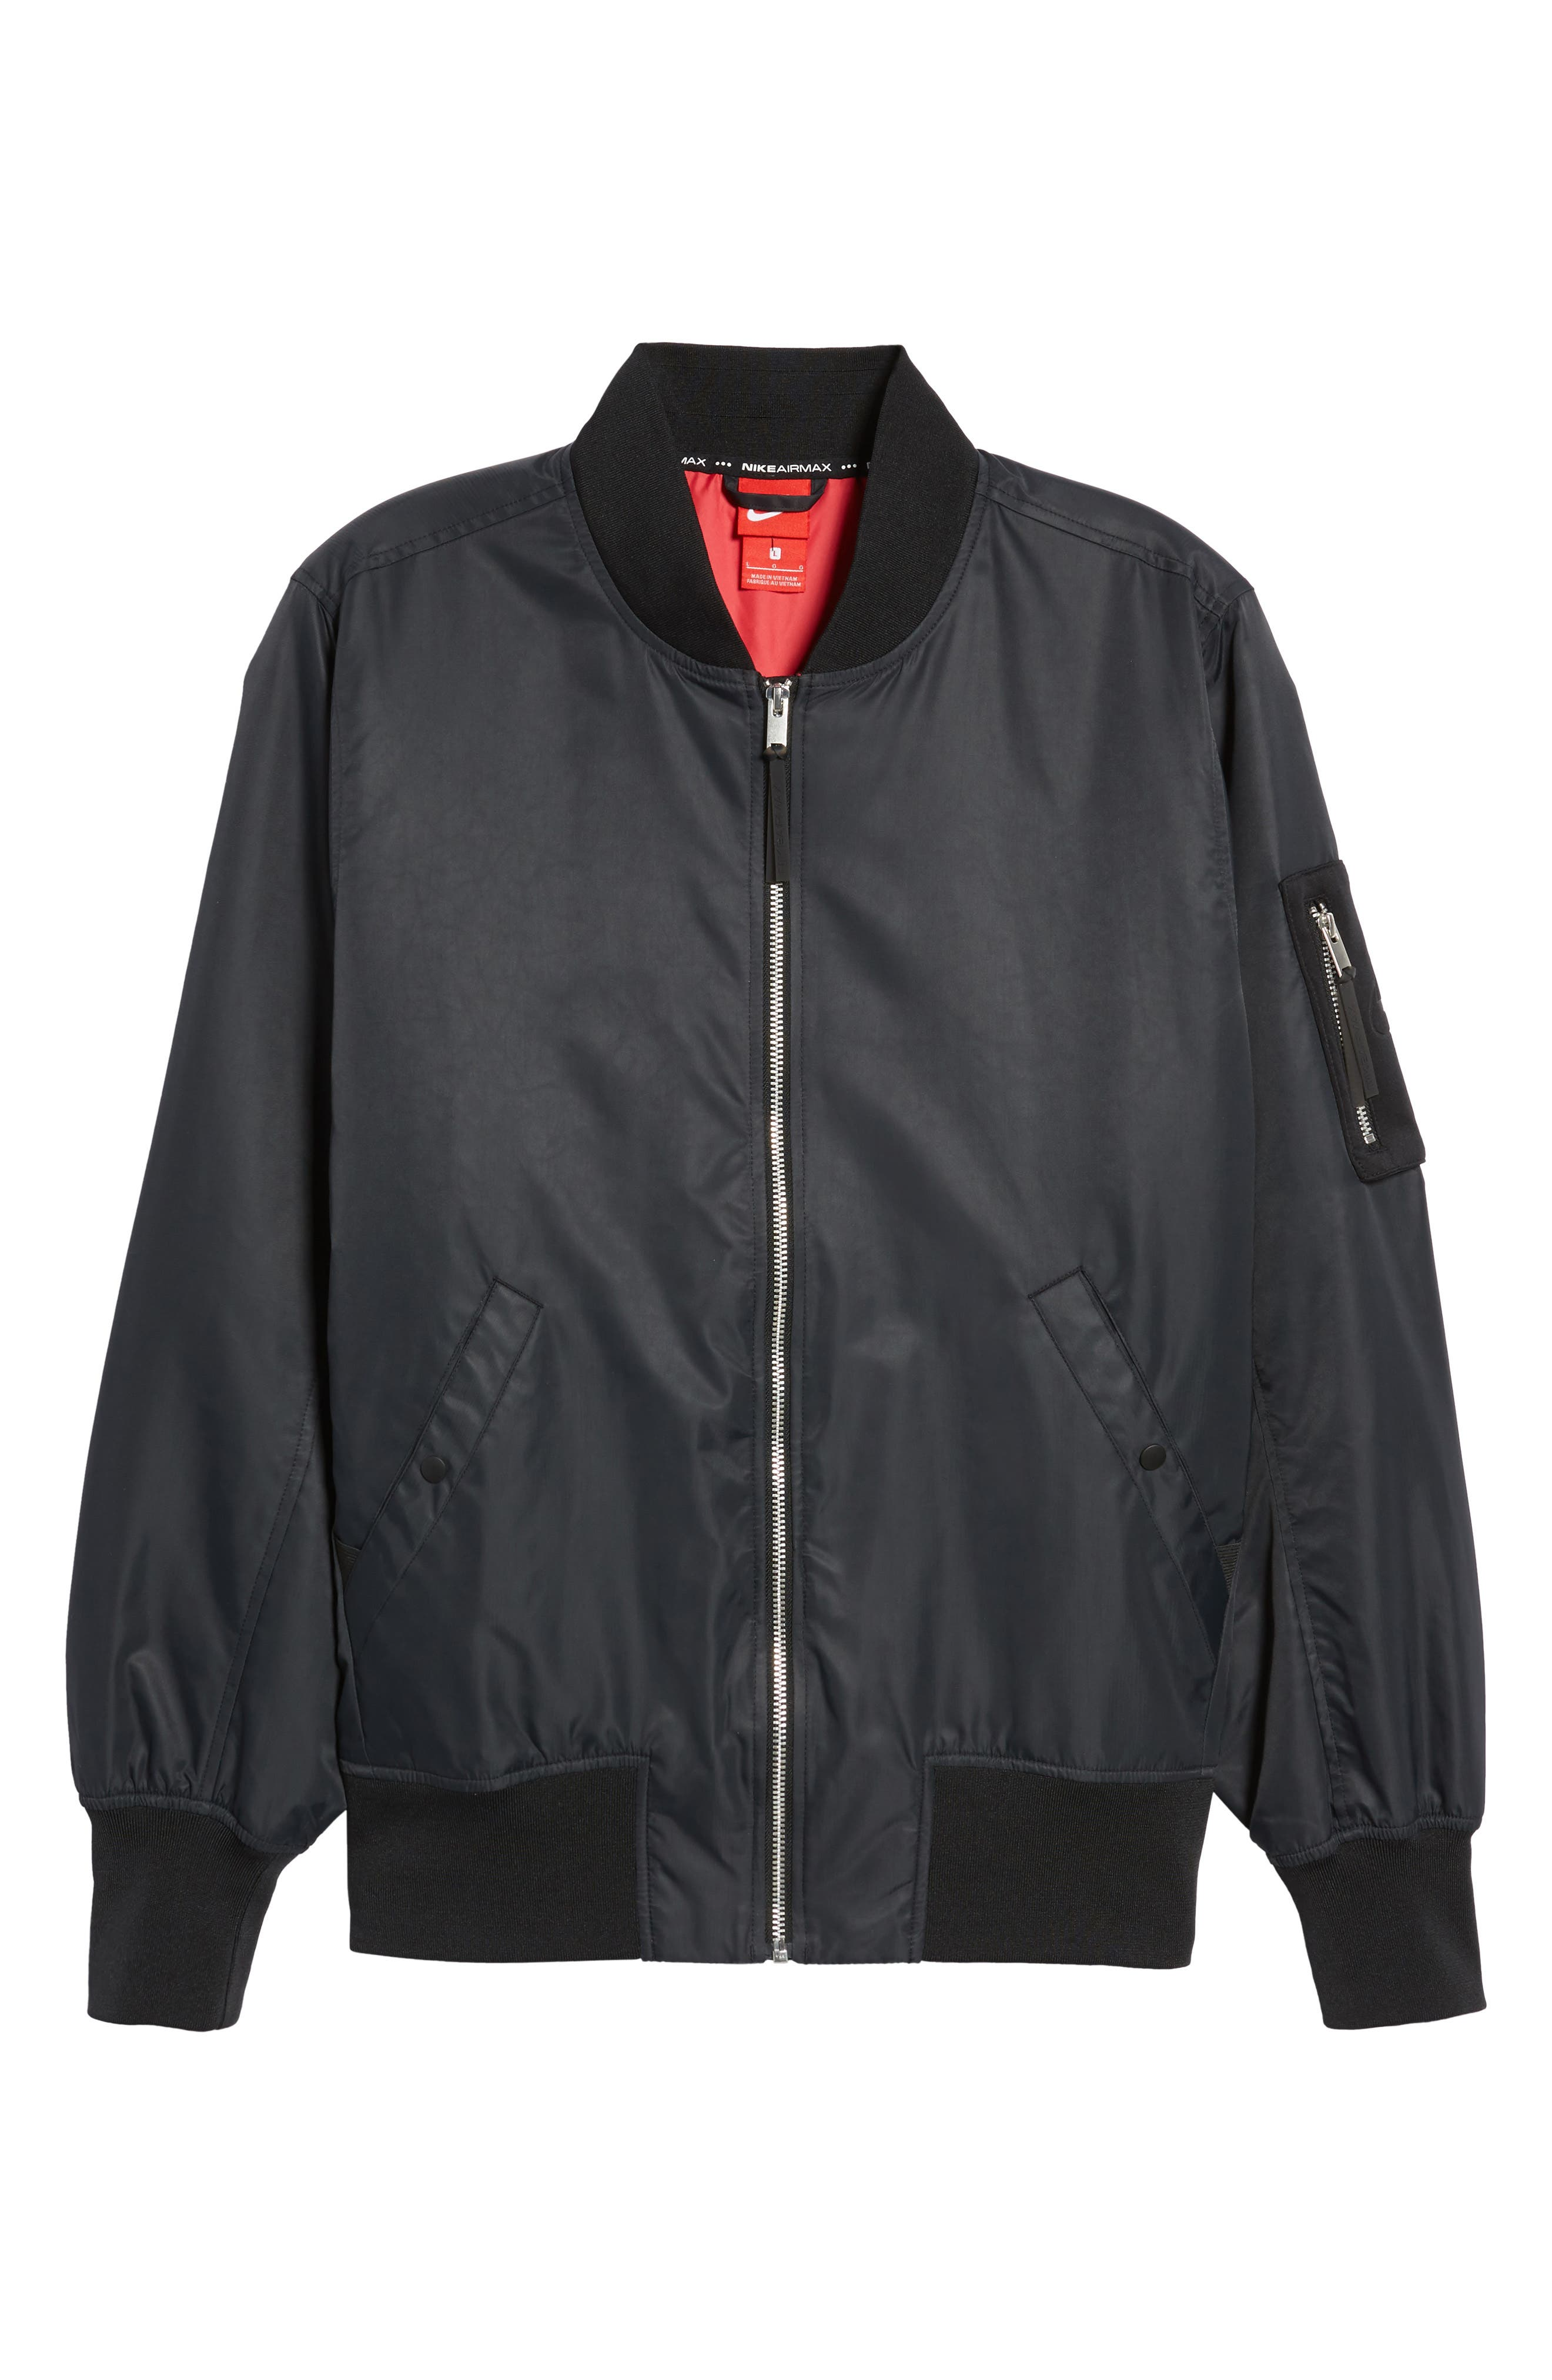 NSW Air Max Woven Bomber Jacket,                             Alternate thumbnail 7, color,                             Black/ Black